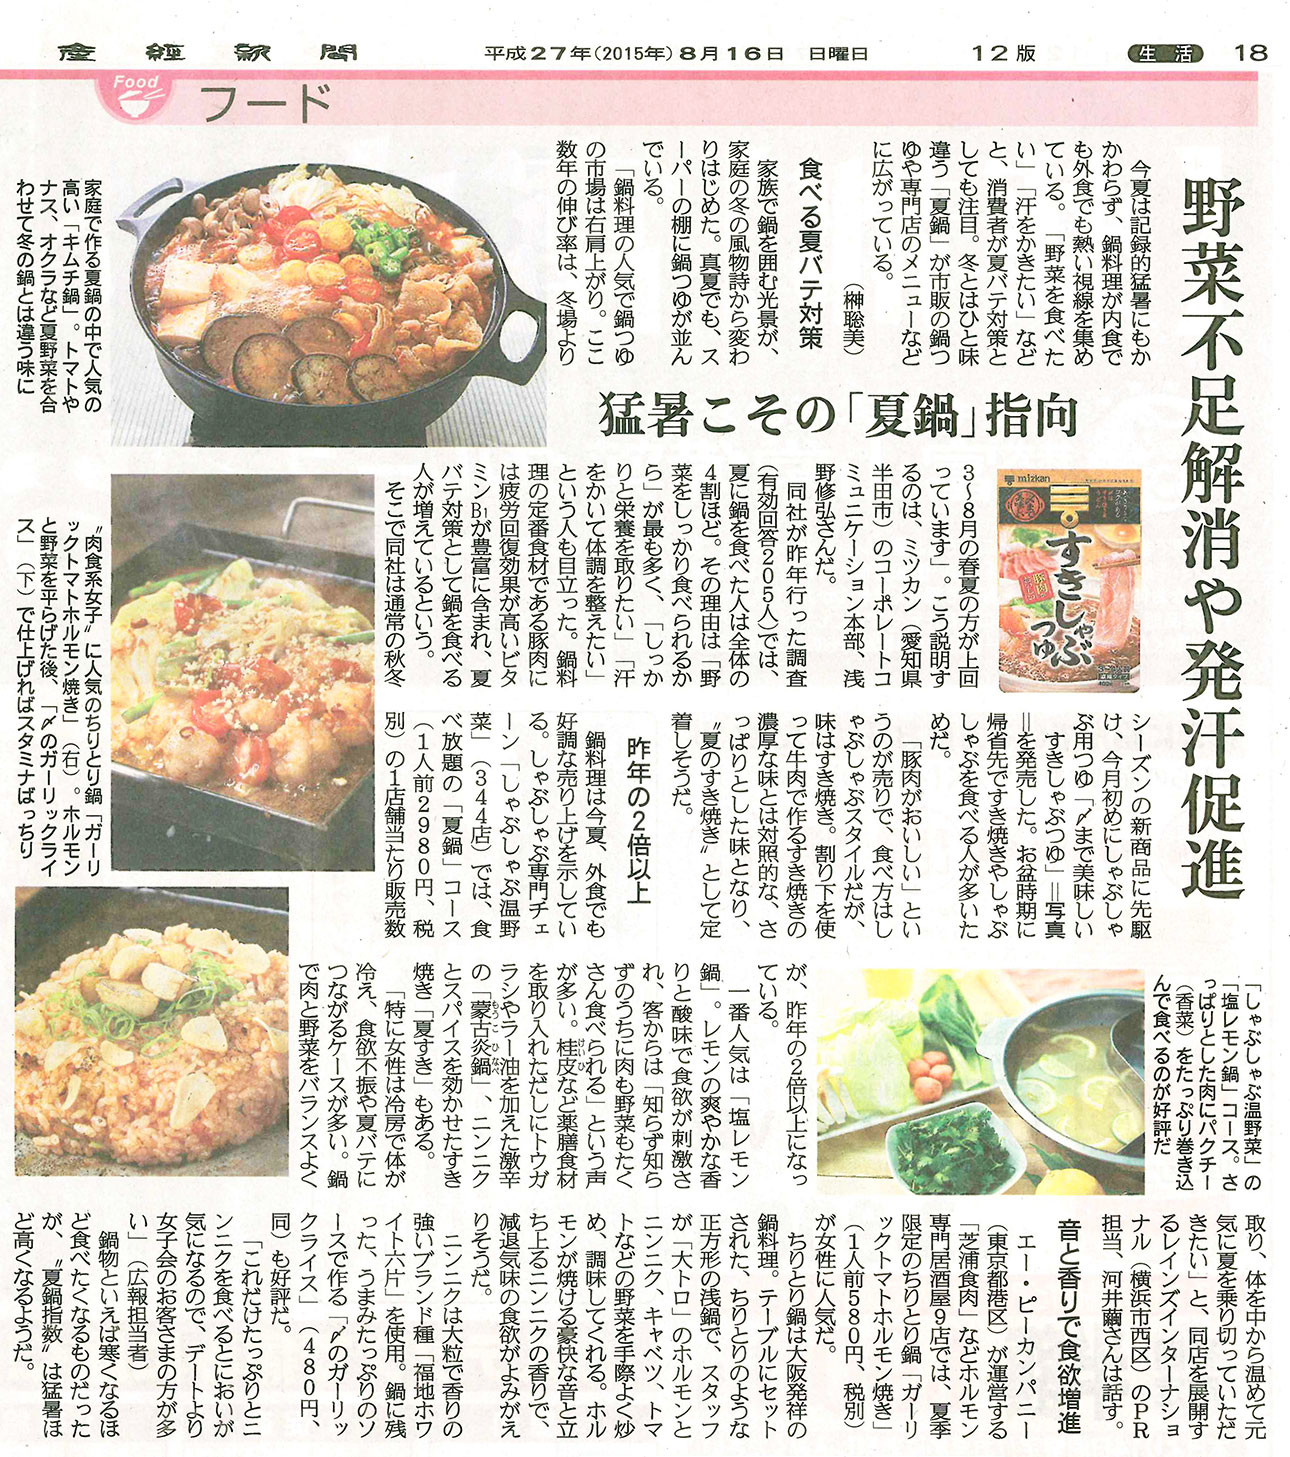 http://www.apcompany.jp/media/150816_%E7%94%A3%E7%B5%8C%E6%96%B0%E8%81%9E.jpg